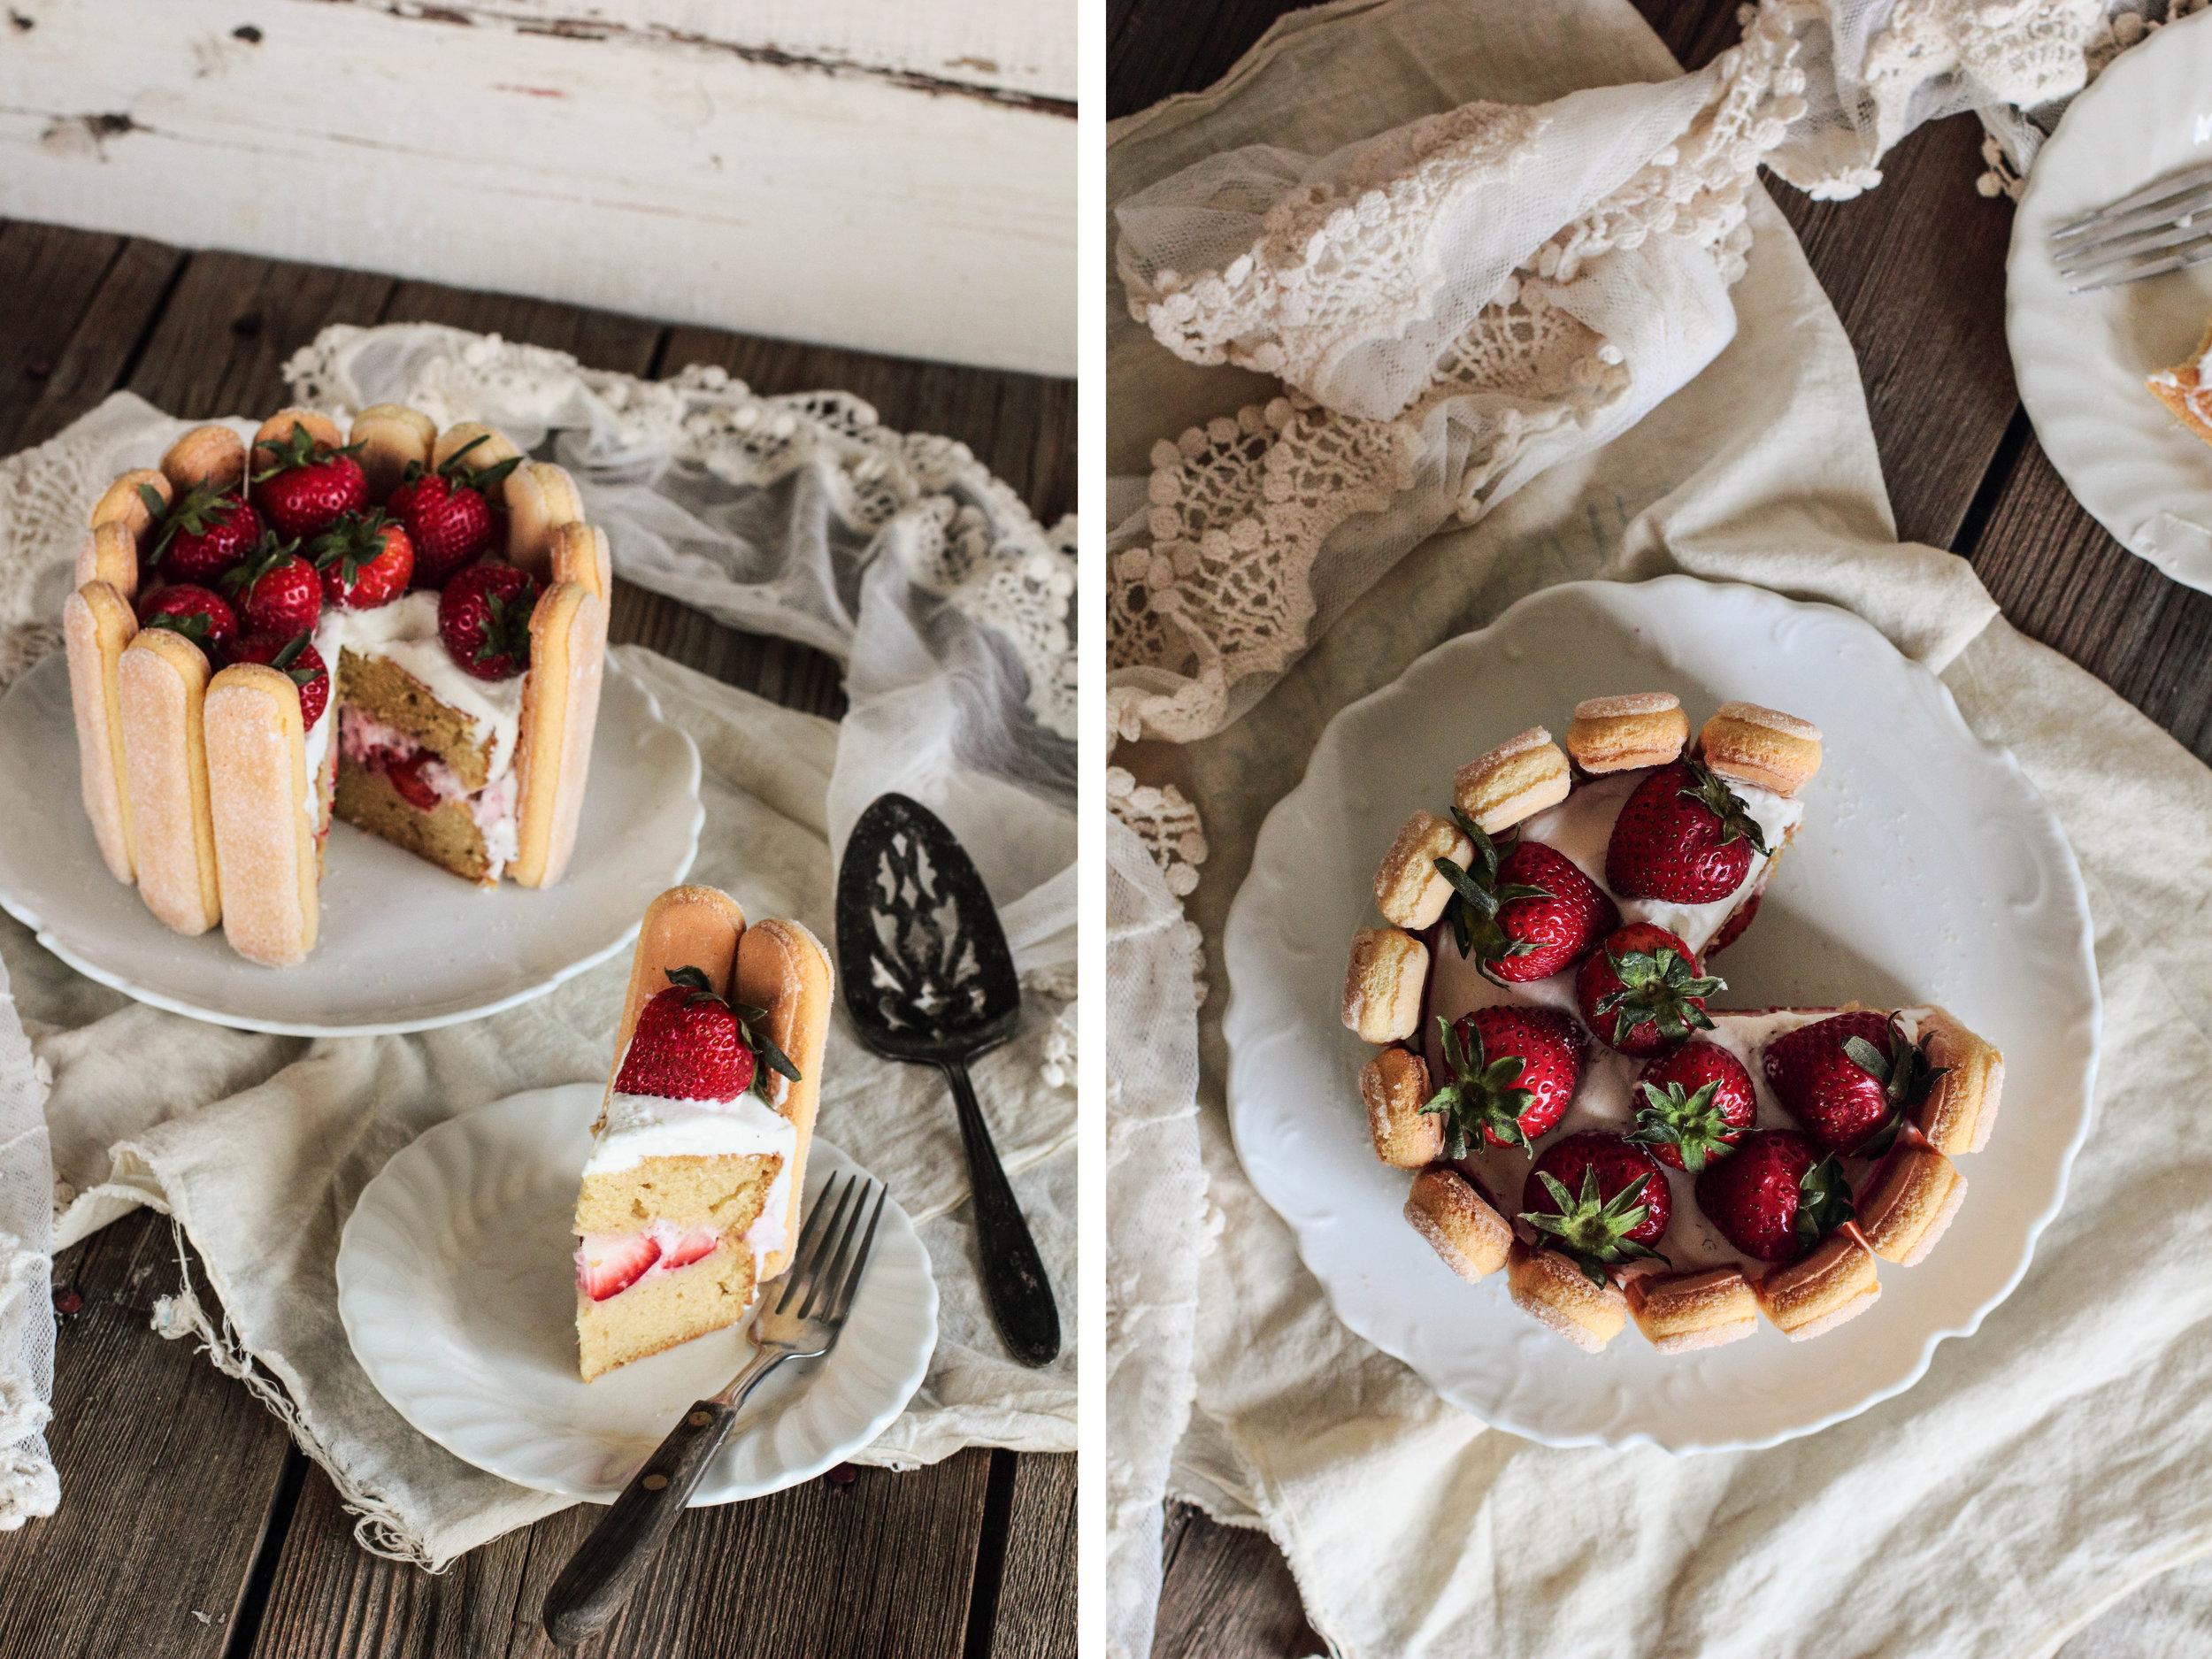 strawberrycharlotte1.jpg